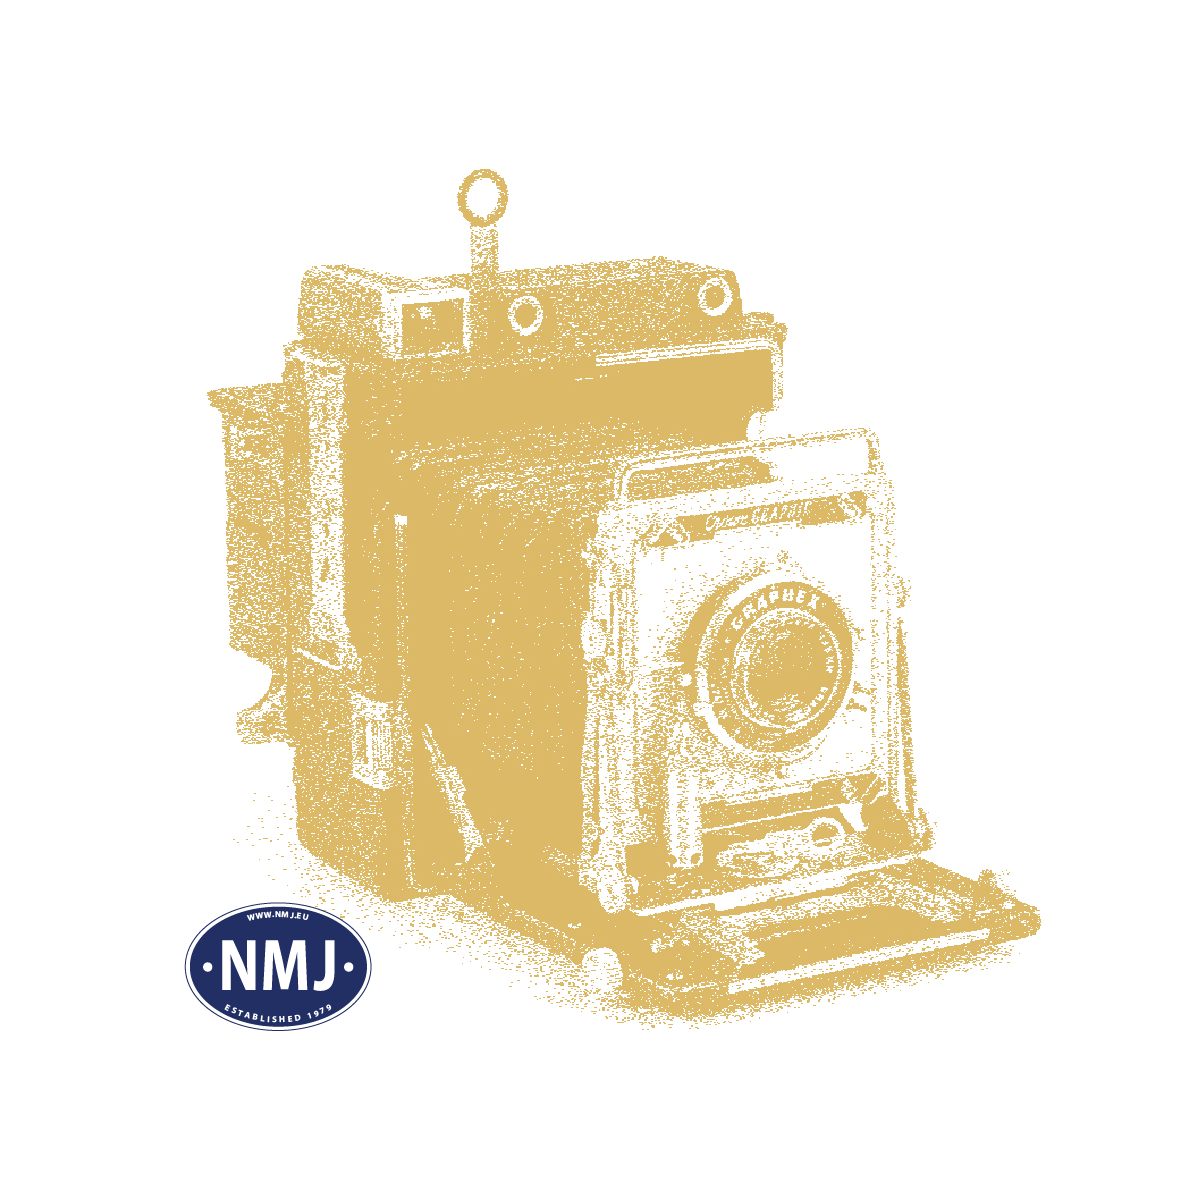 NMJT90401 - NMJ Topline SNCB 202020, DCC m/ Sound